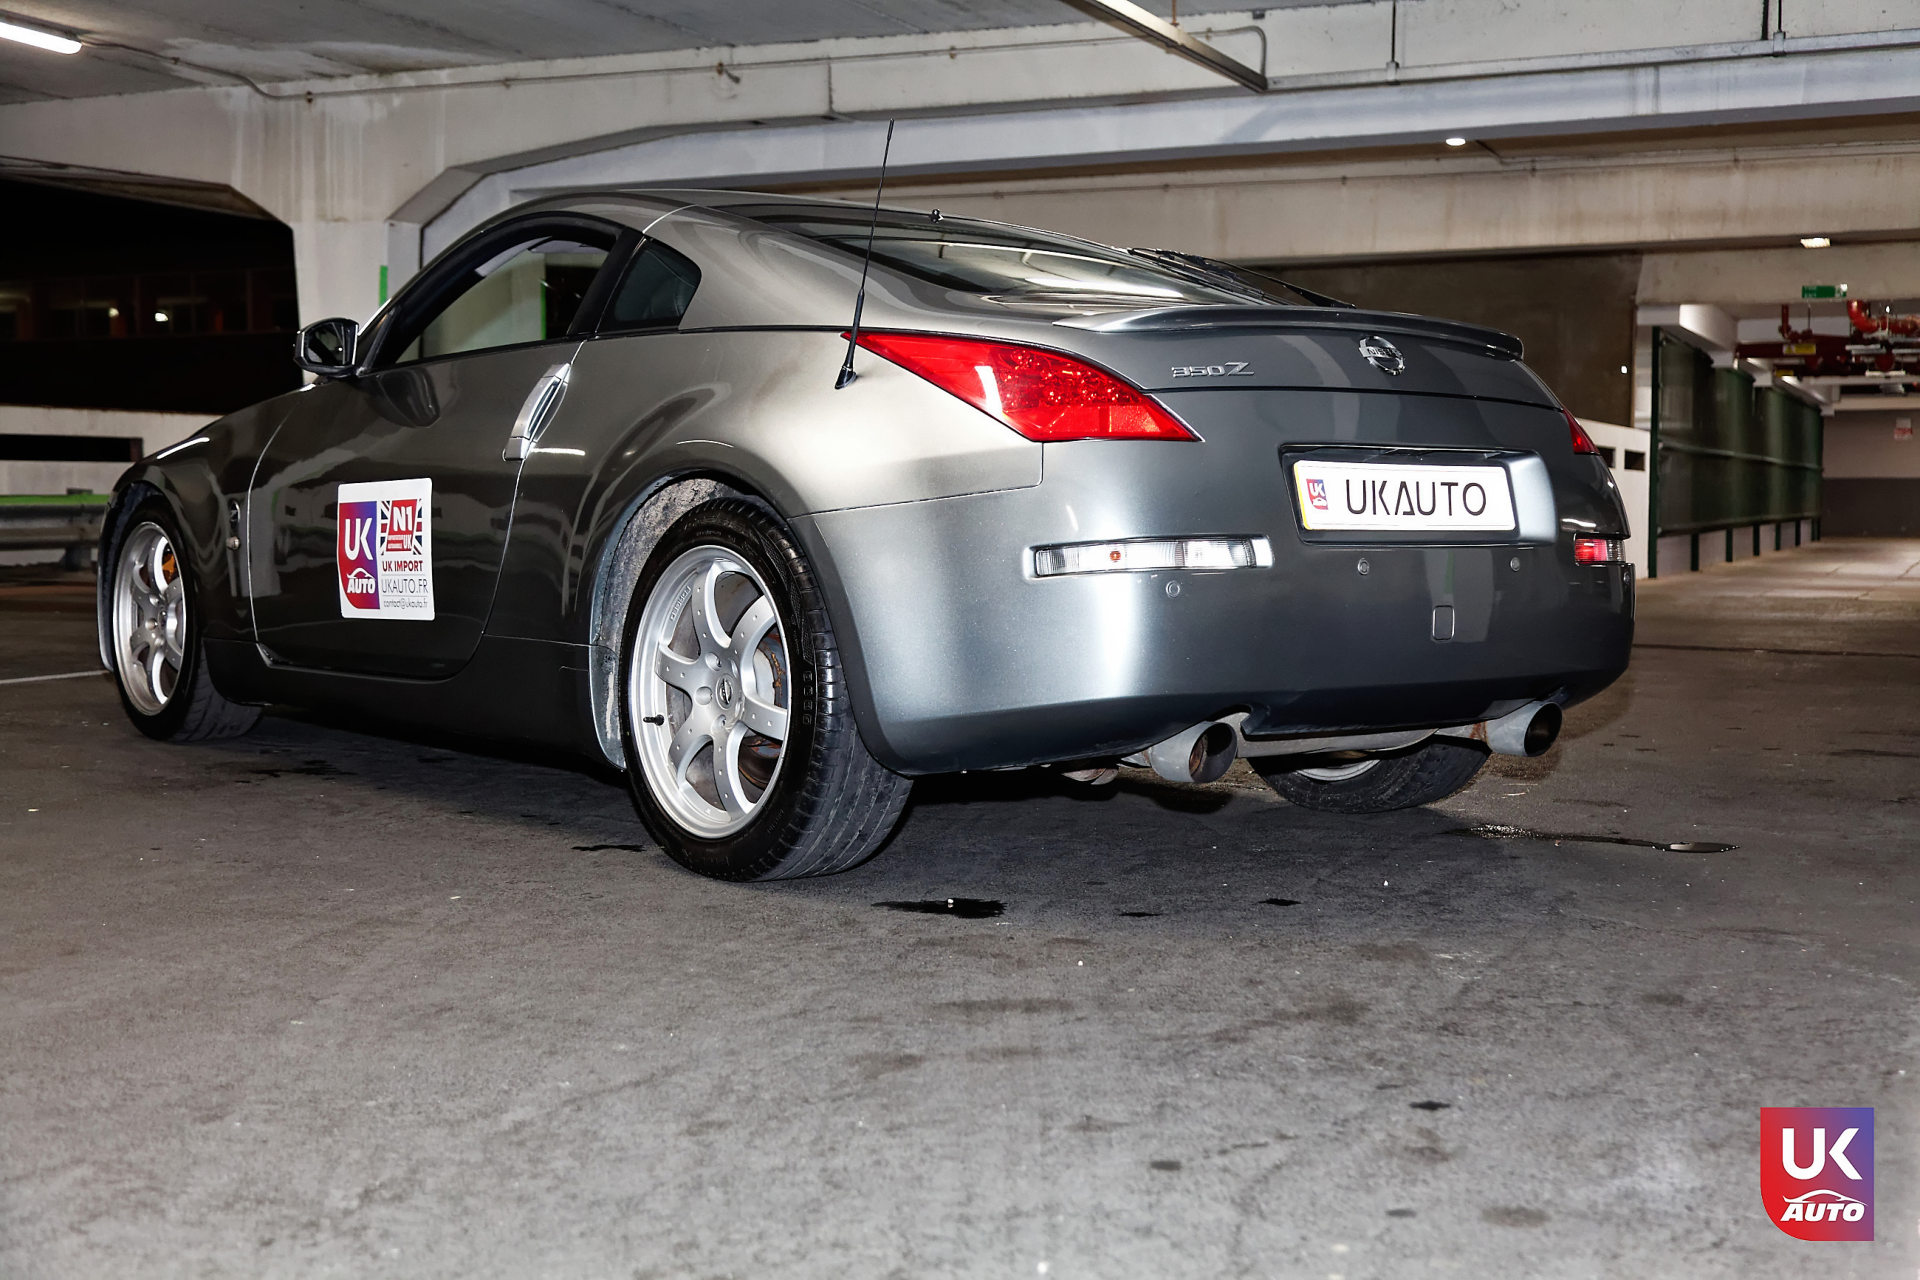 Nissan 350z rhd v6 nissan angleterre nissan uk nissan import rhd voiture occasion mandataire nissan 12 DxO - NISSAN ANGLETERRE IMPORT NISSAN 350Z V6 RHD 3.5 MANDATAIRE NISSAN AUTO AVANT LE BREXIT FELICITATION A XABI